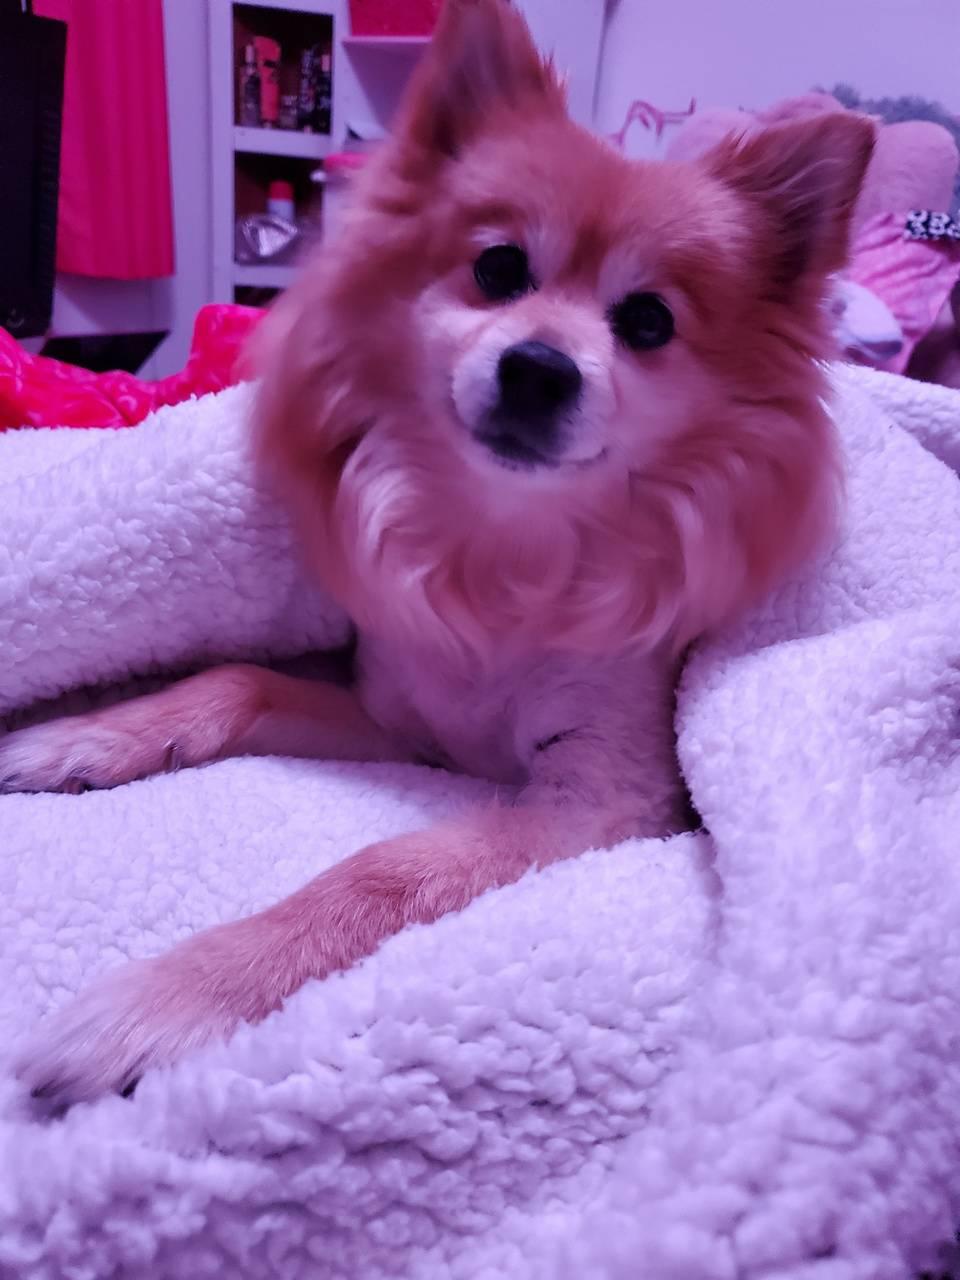 pom in a blanket